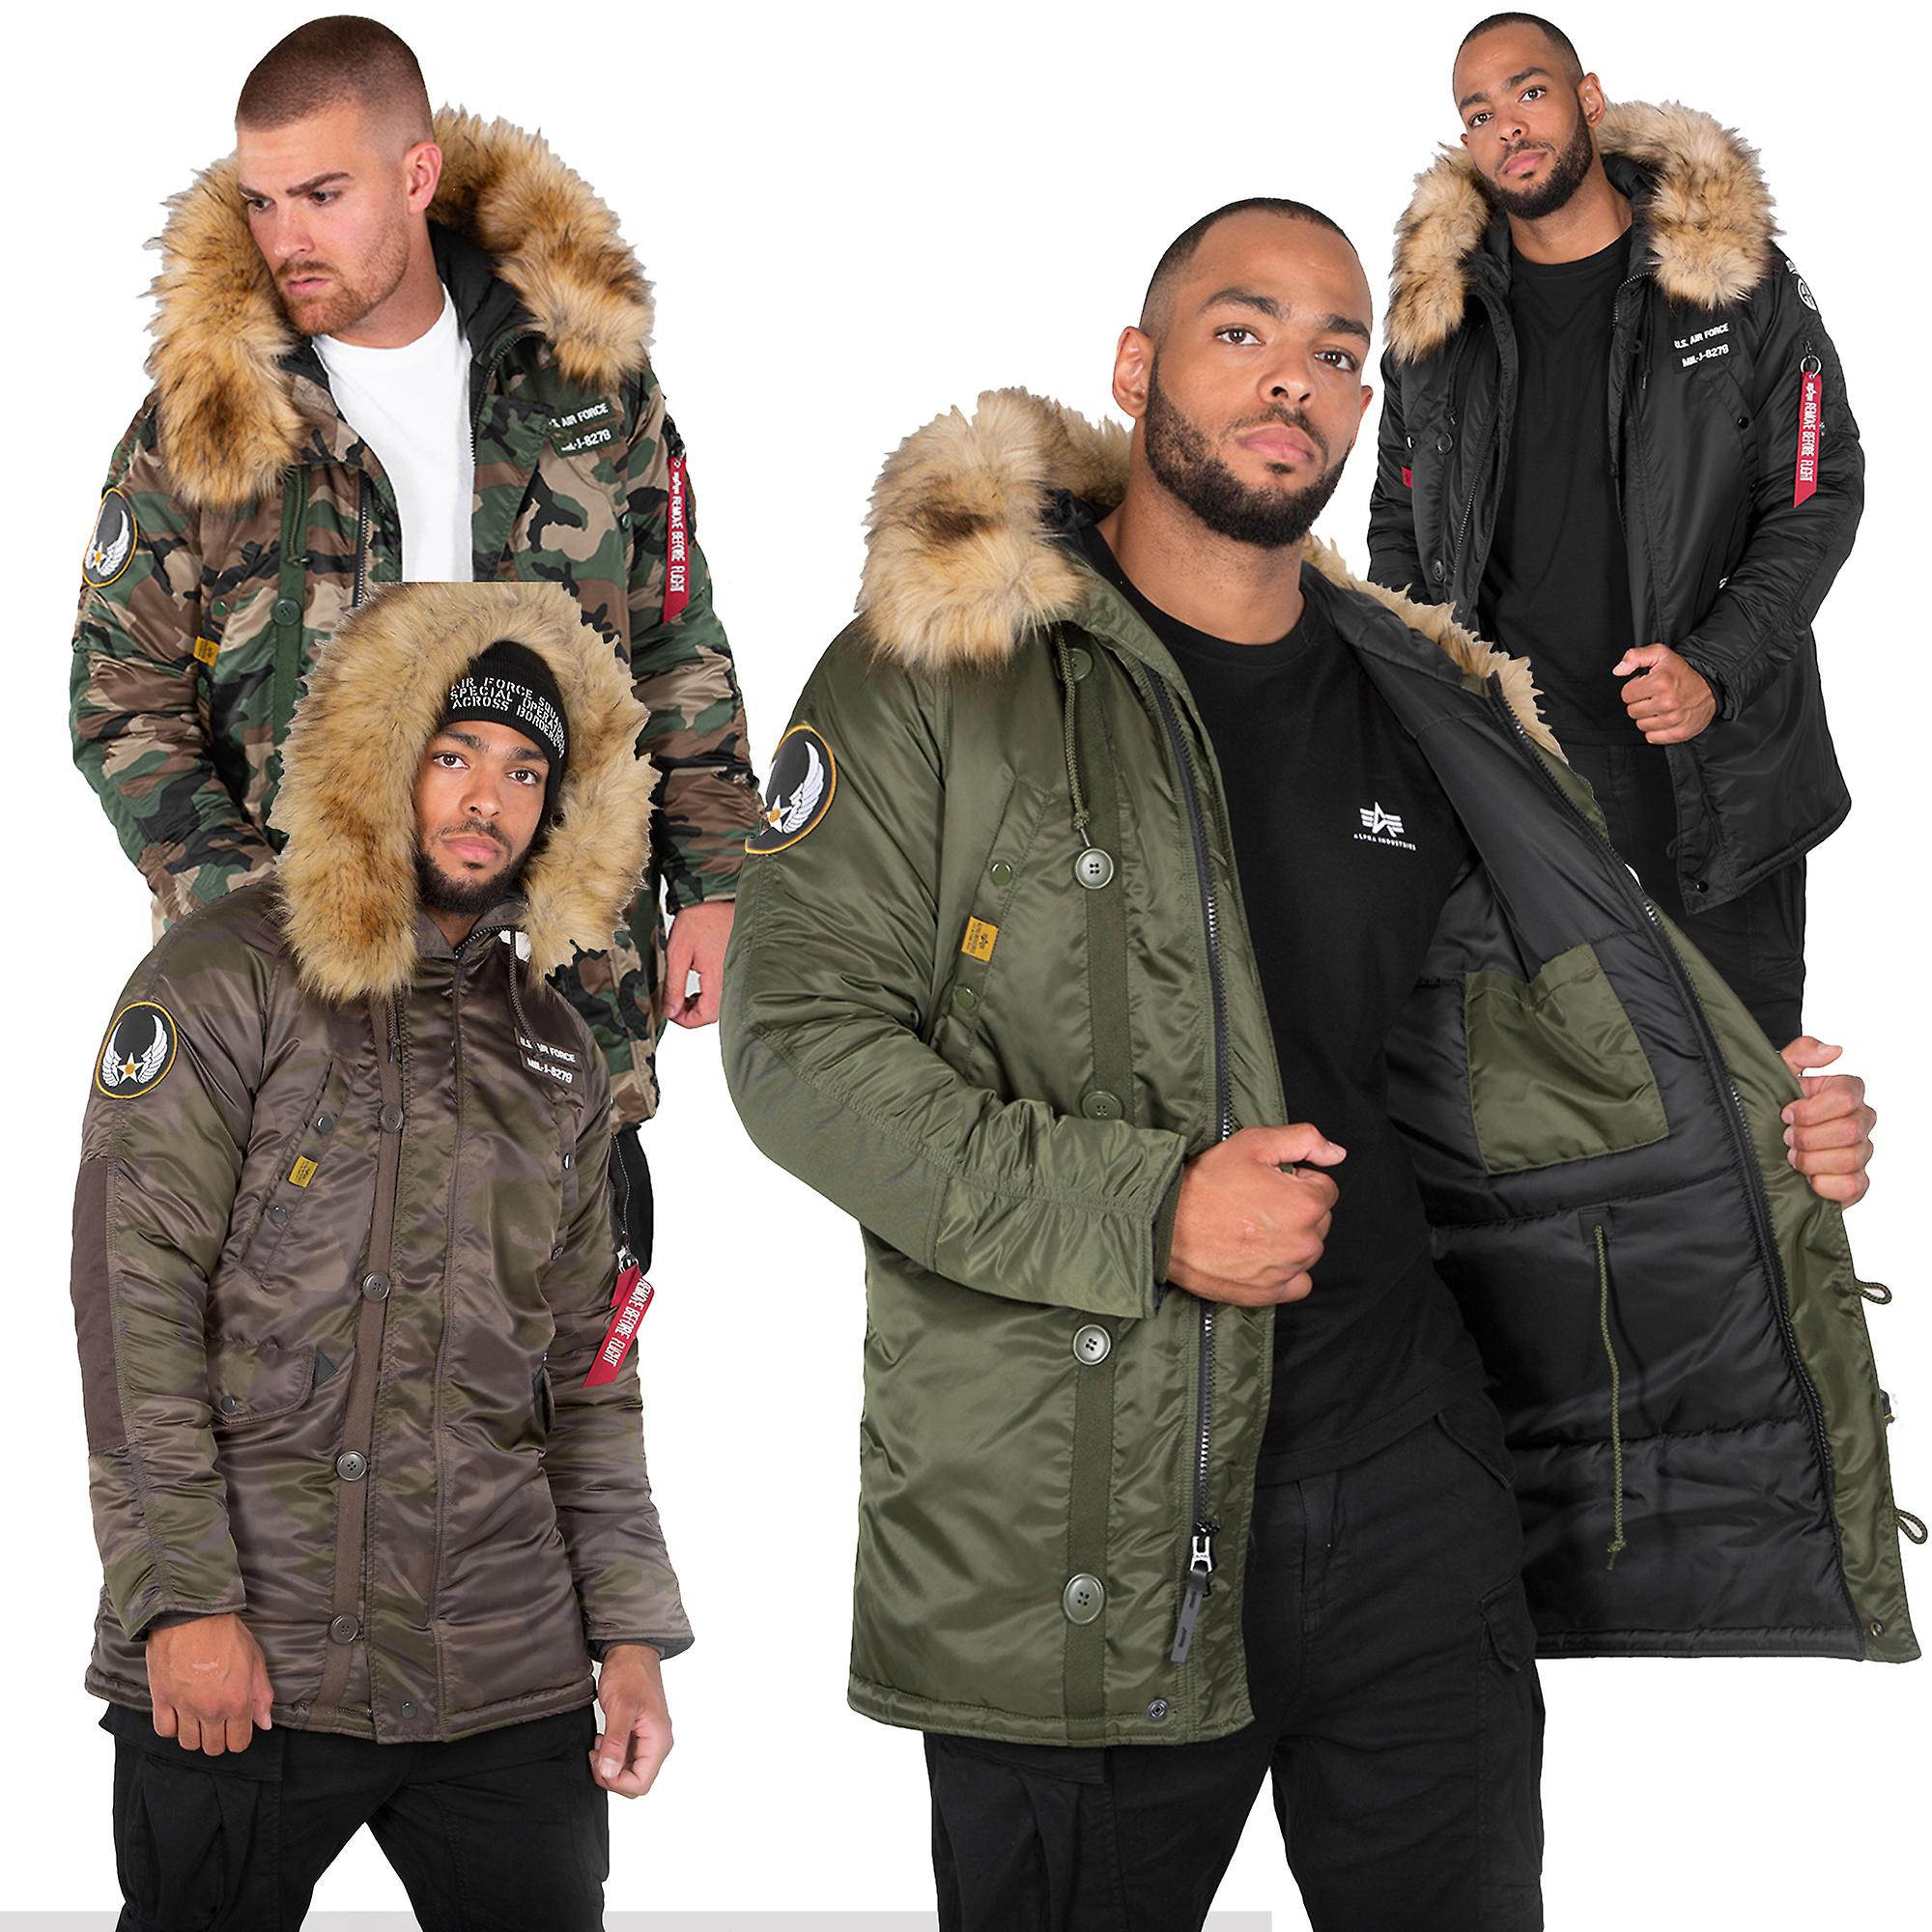 newest collection 5b6e7 e790e Alpha industries men's winter jacket N3B airborne